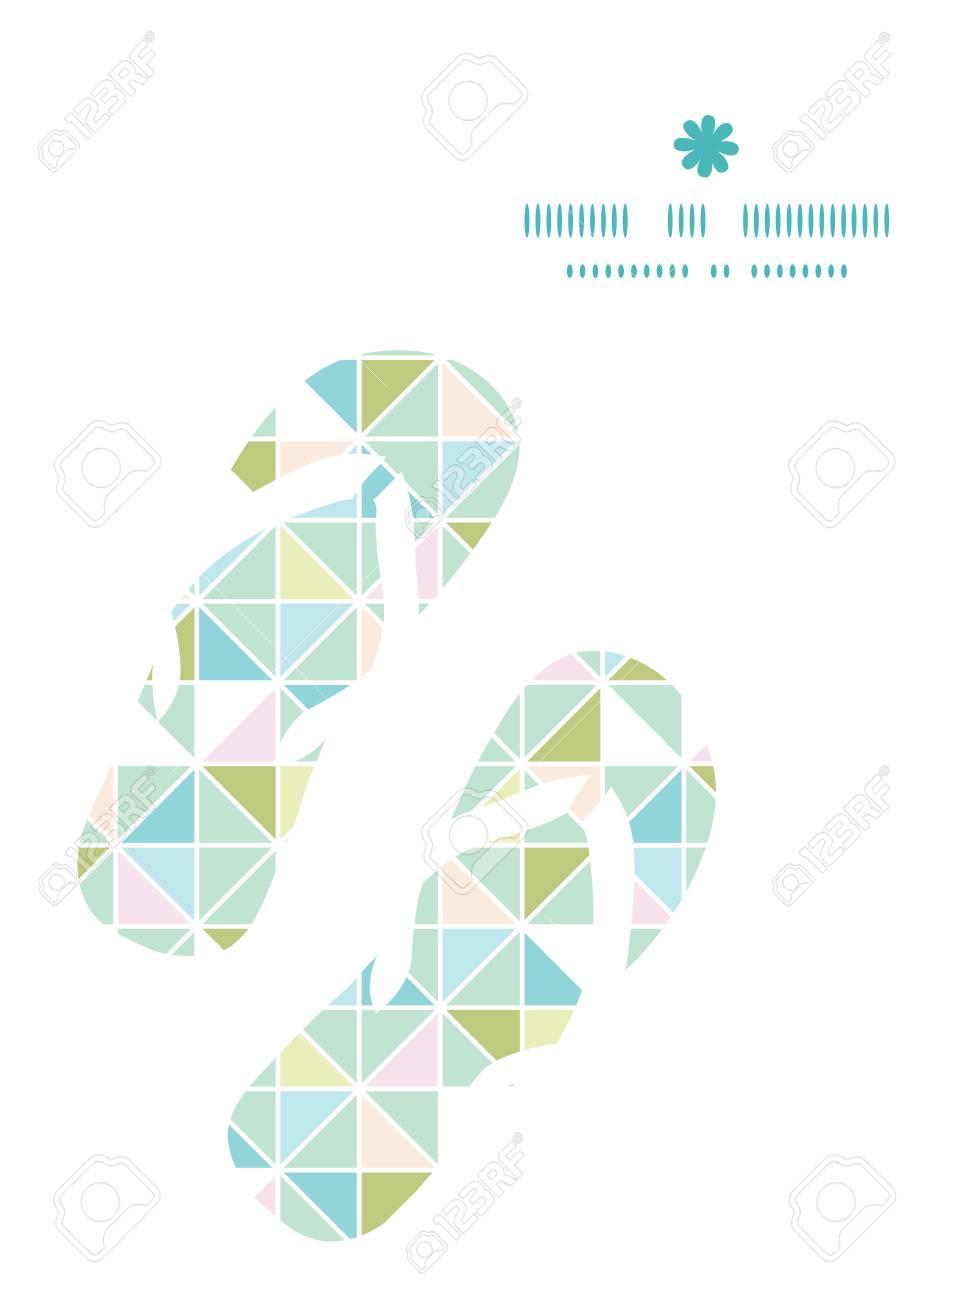 Vector Colorido Pasteles Textura De Triángulo Chanclas Marco Modelo ...